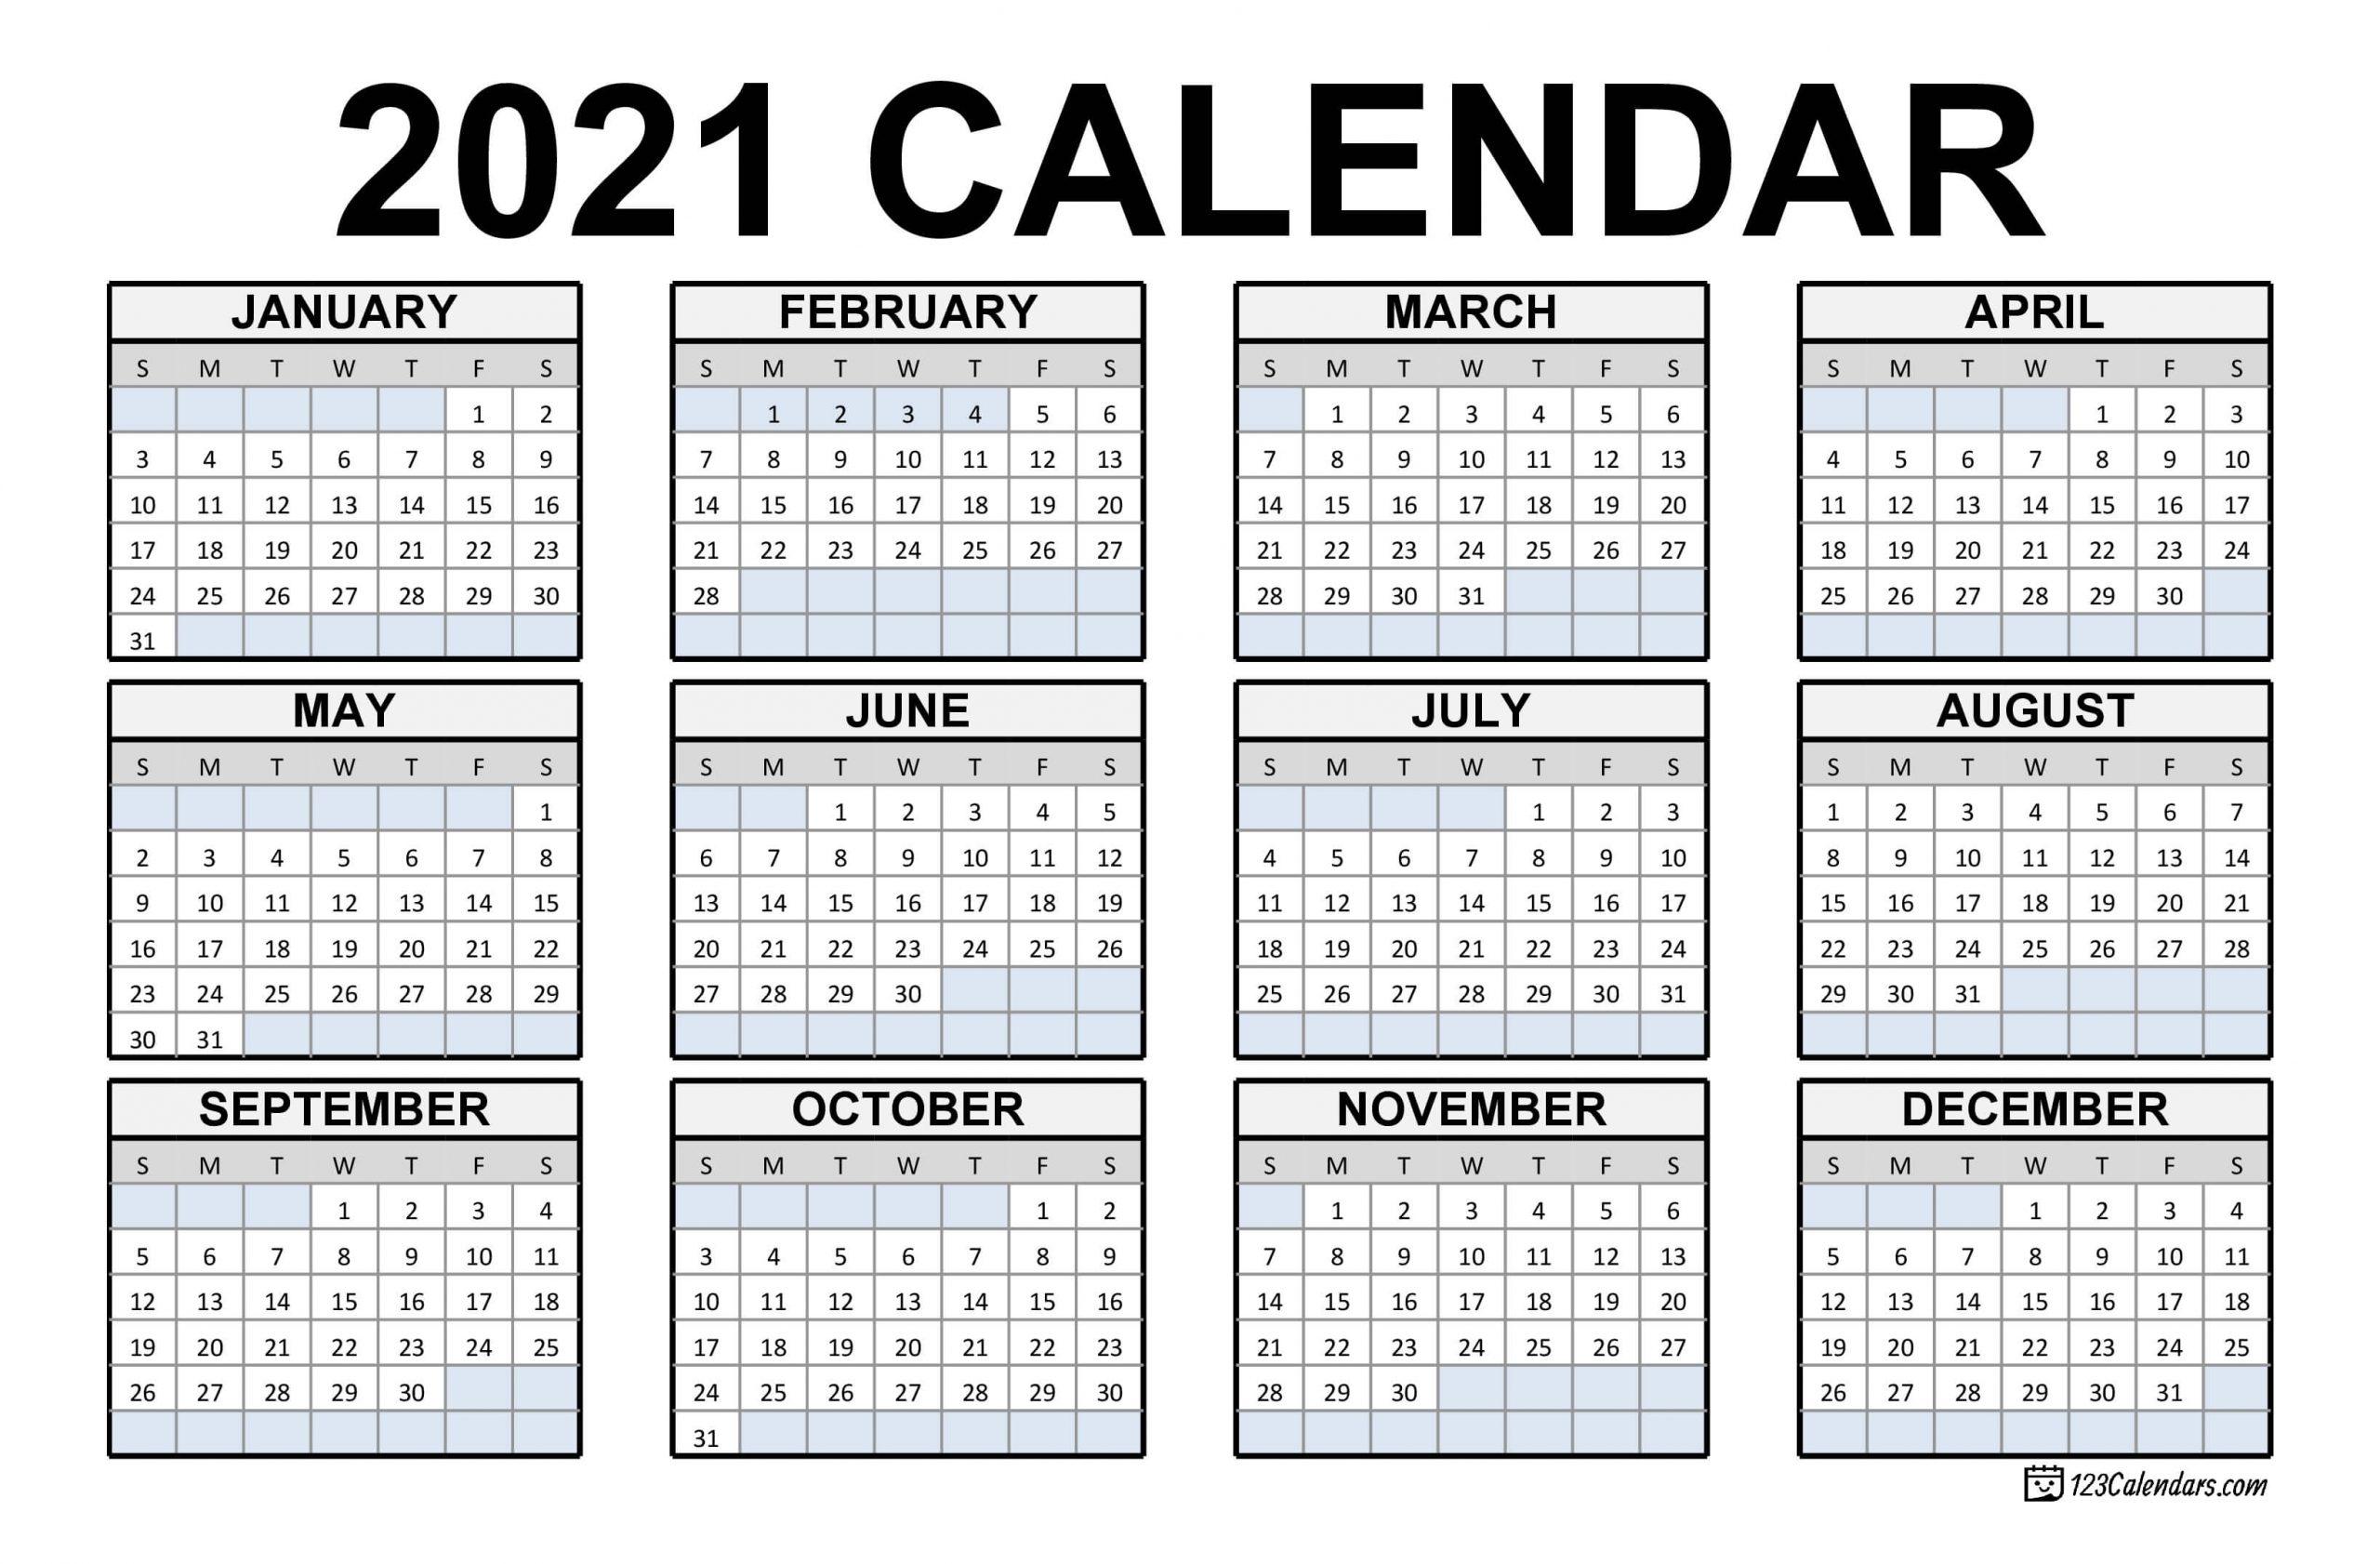 Get 2021 Philippine Calendar With Holidays